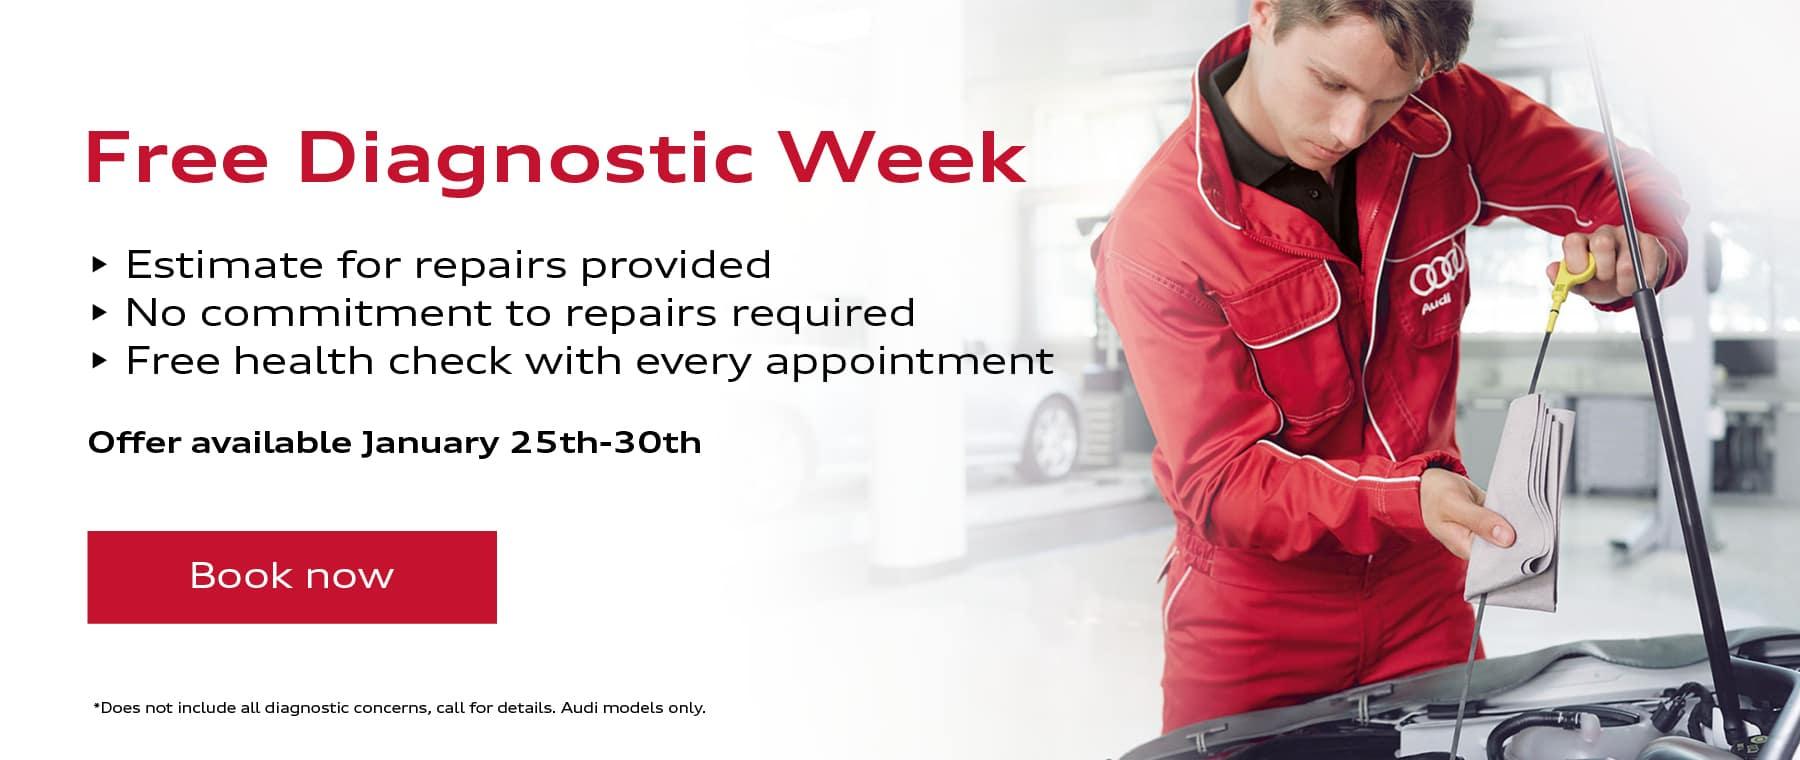 1494590_AWG_Free Diagnostic Week_WB